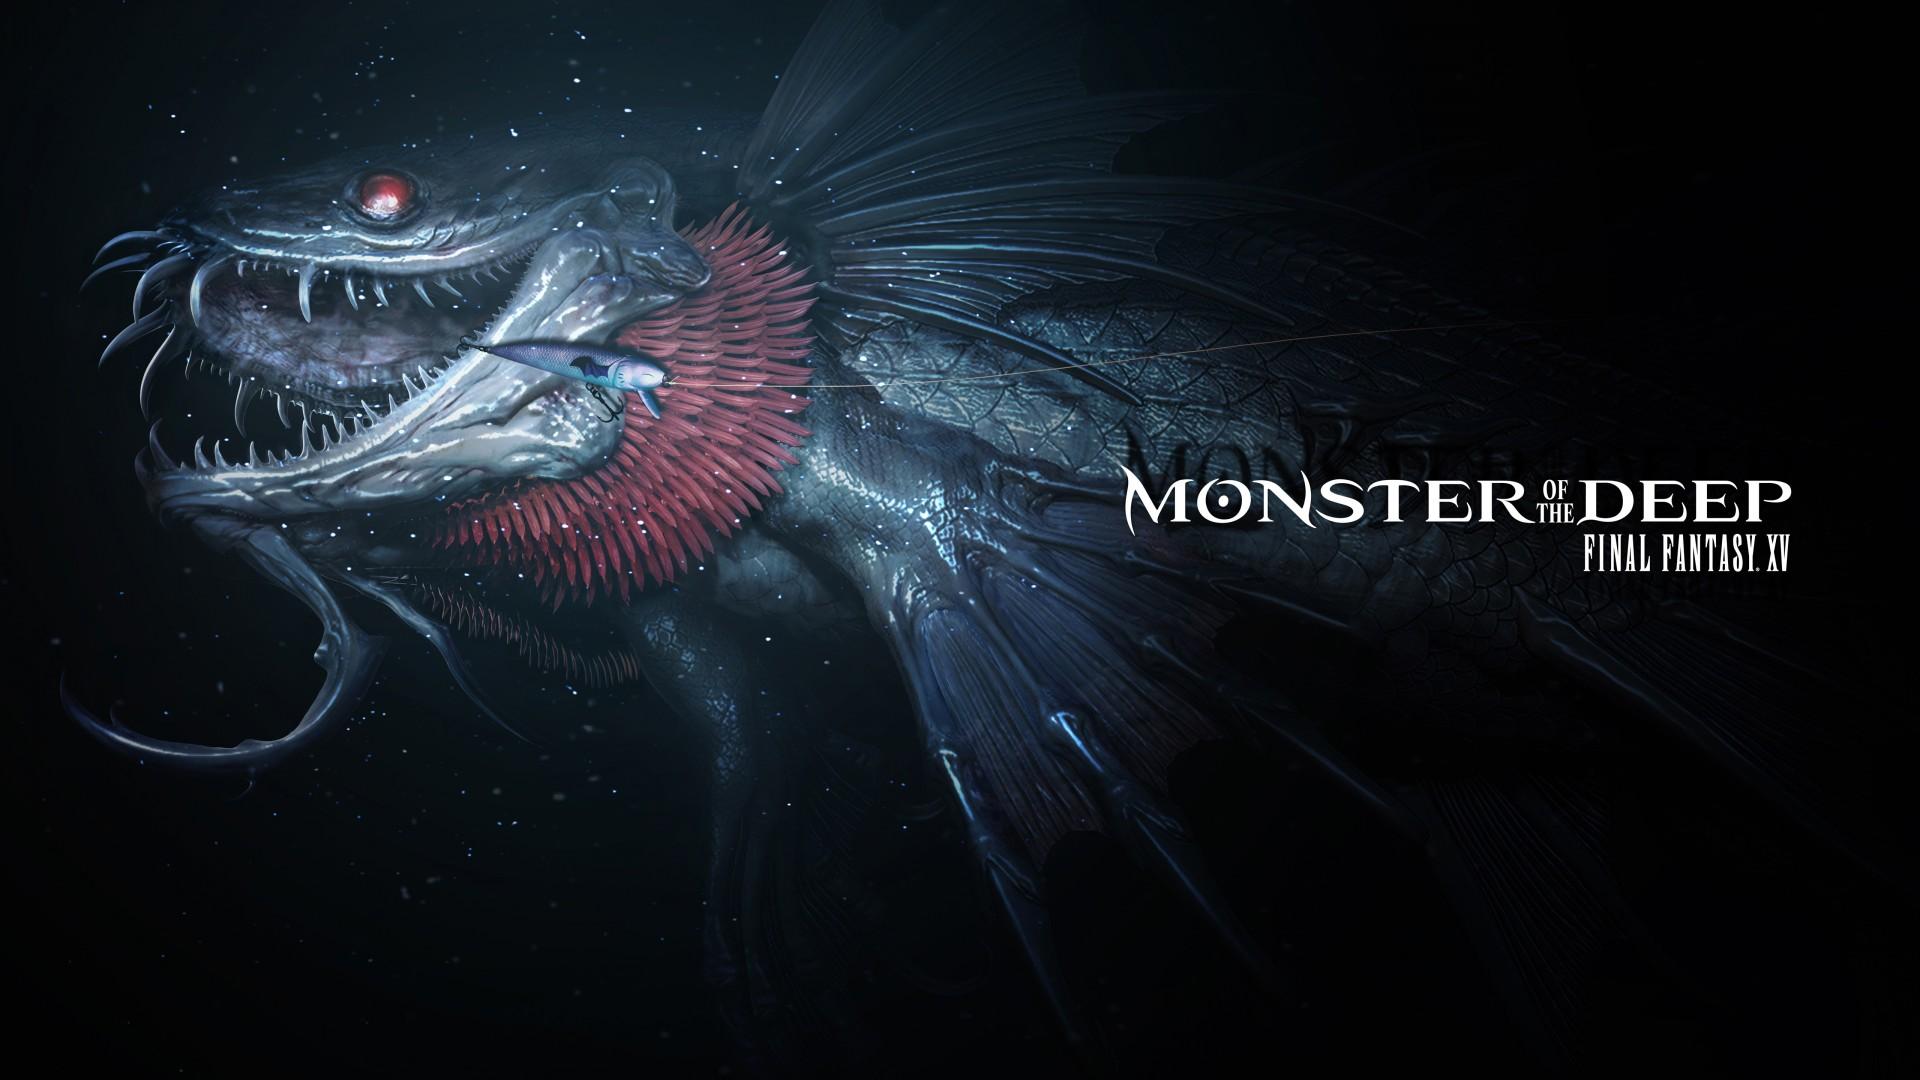 Final Fantasy Xv Wallpaper Iphone X Monster Of The Deep Final Fantasy Xv E3 2017 5k Wallpapers